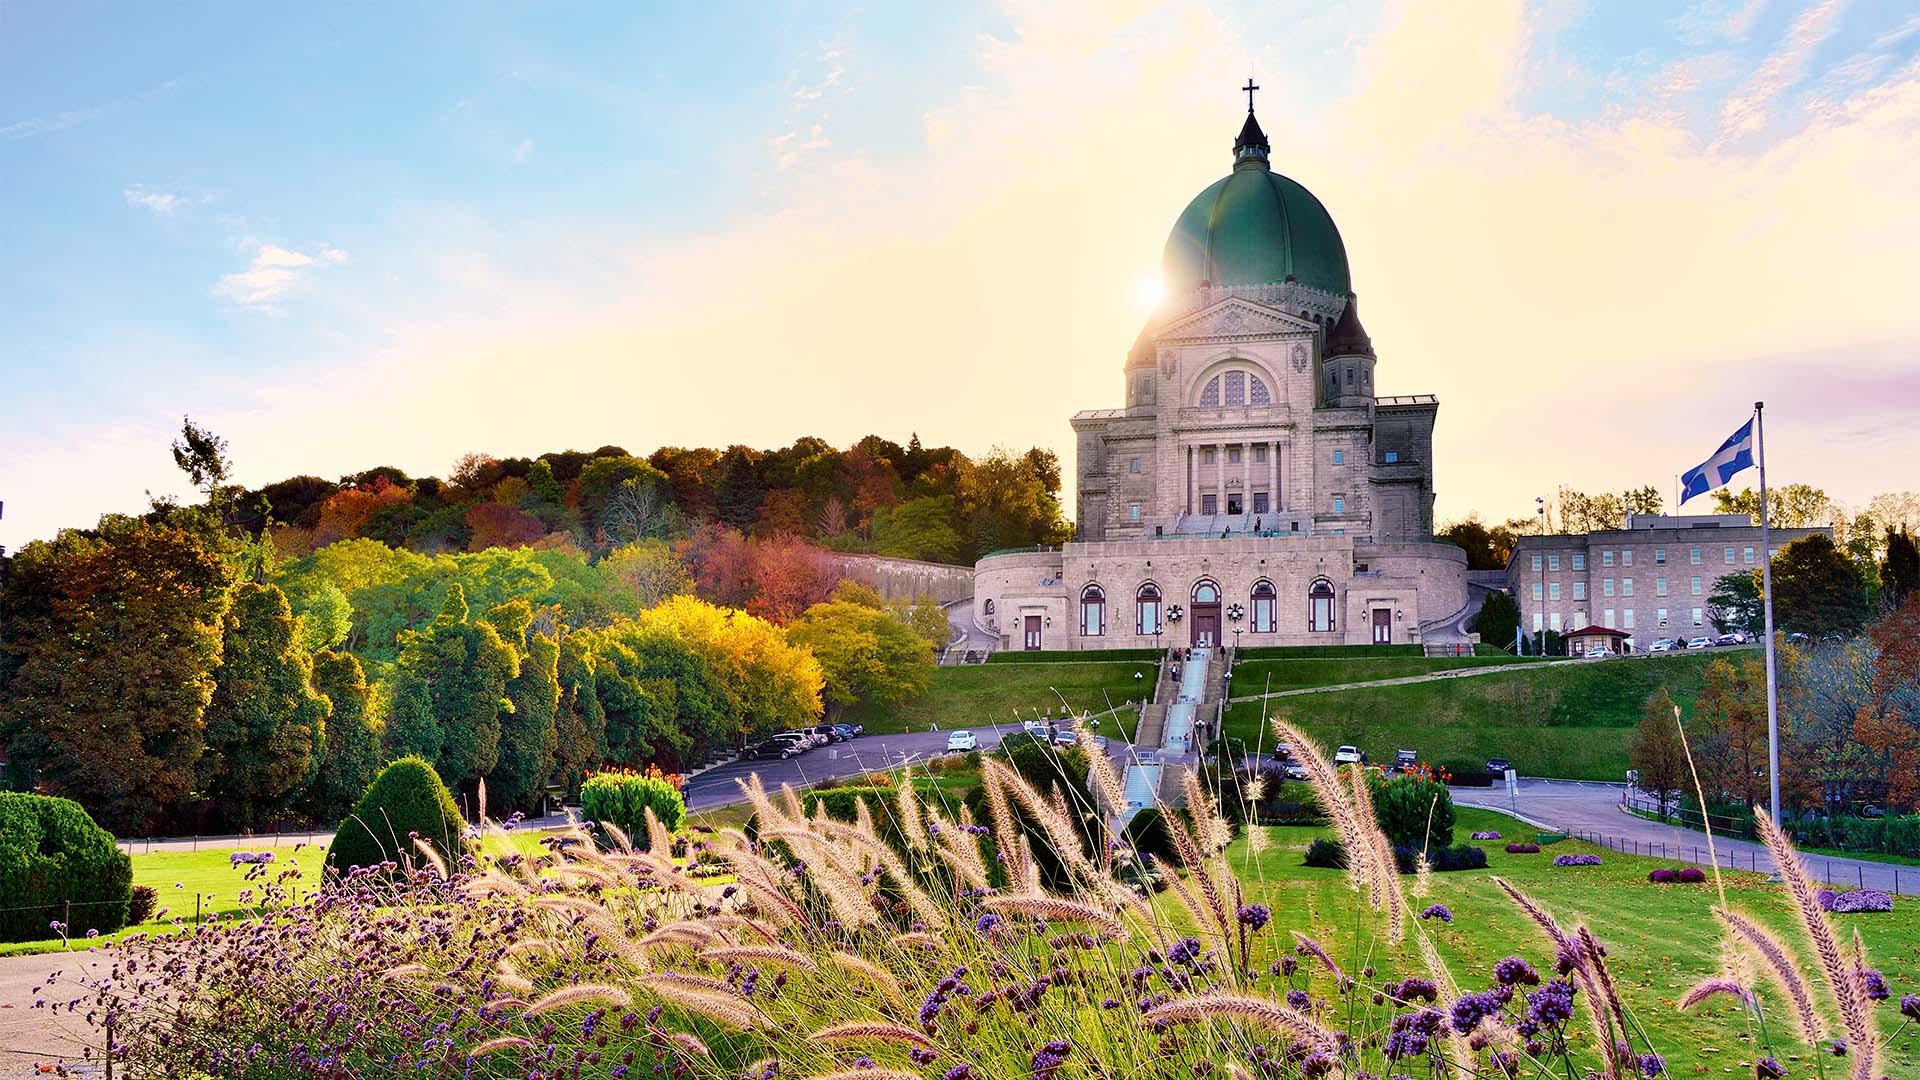 Oratory Montreal, Canada